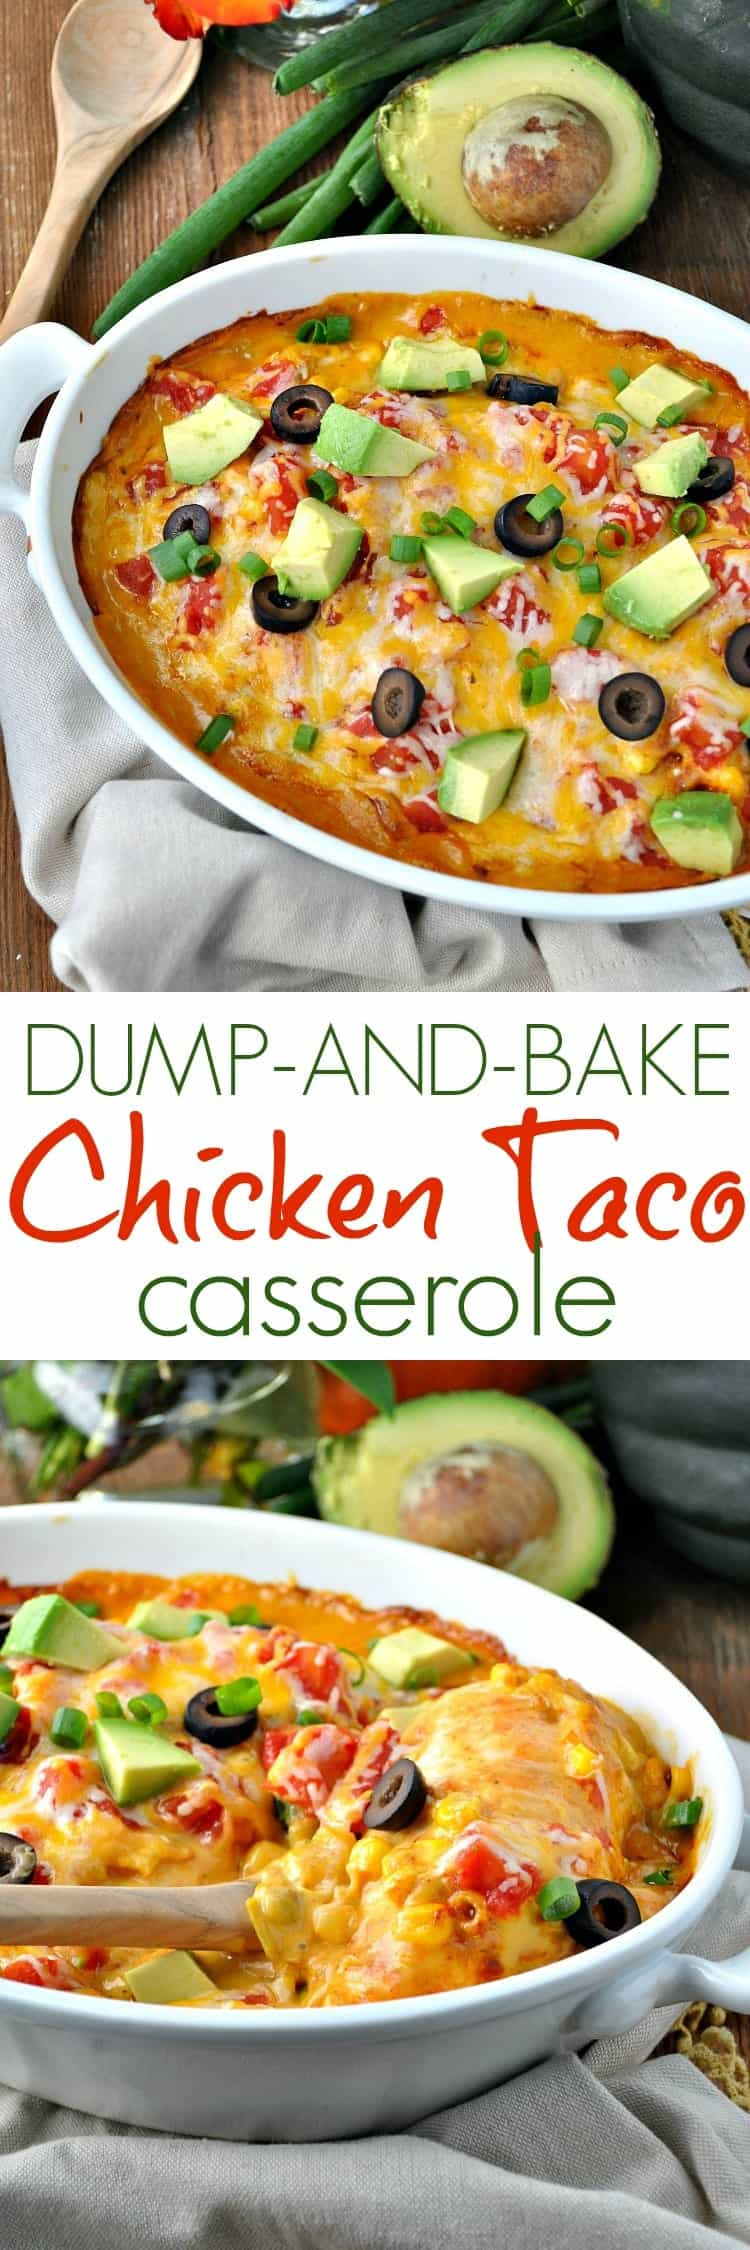 Dump and Bake Chicken Taco Casserole